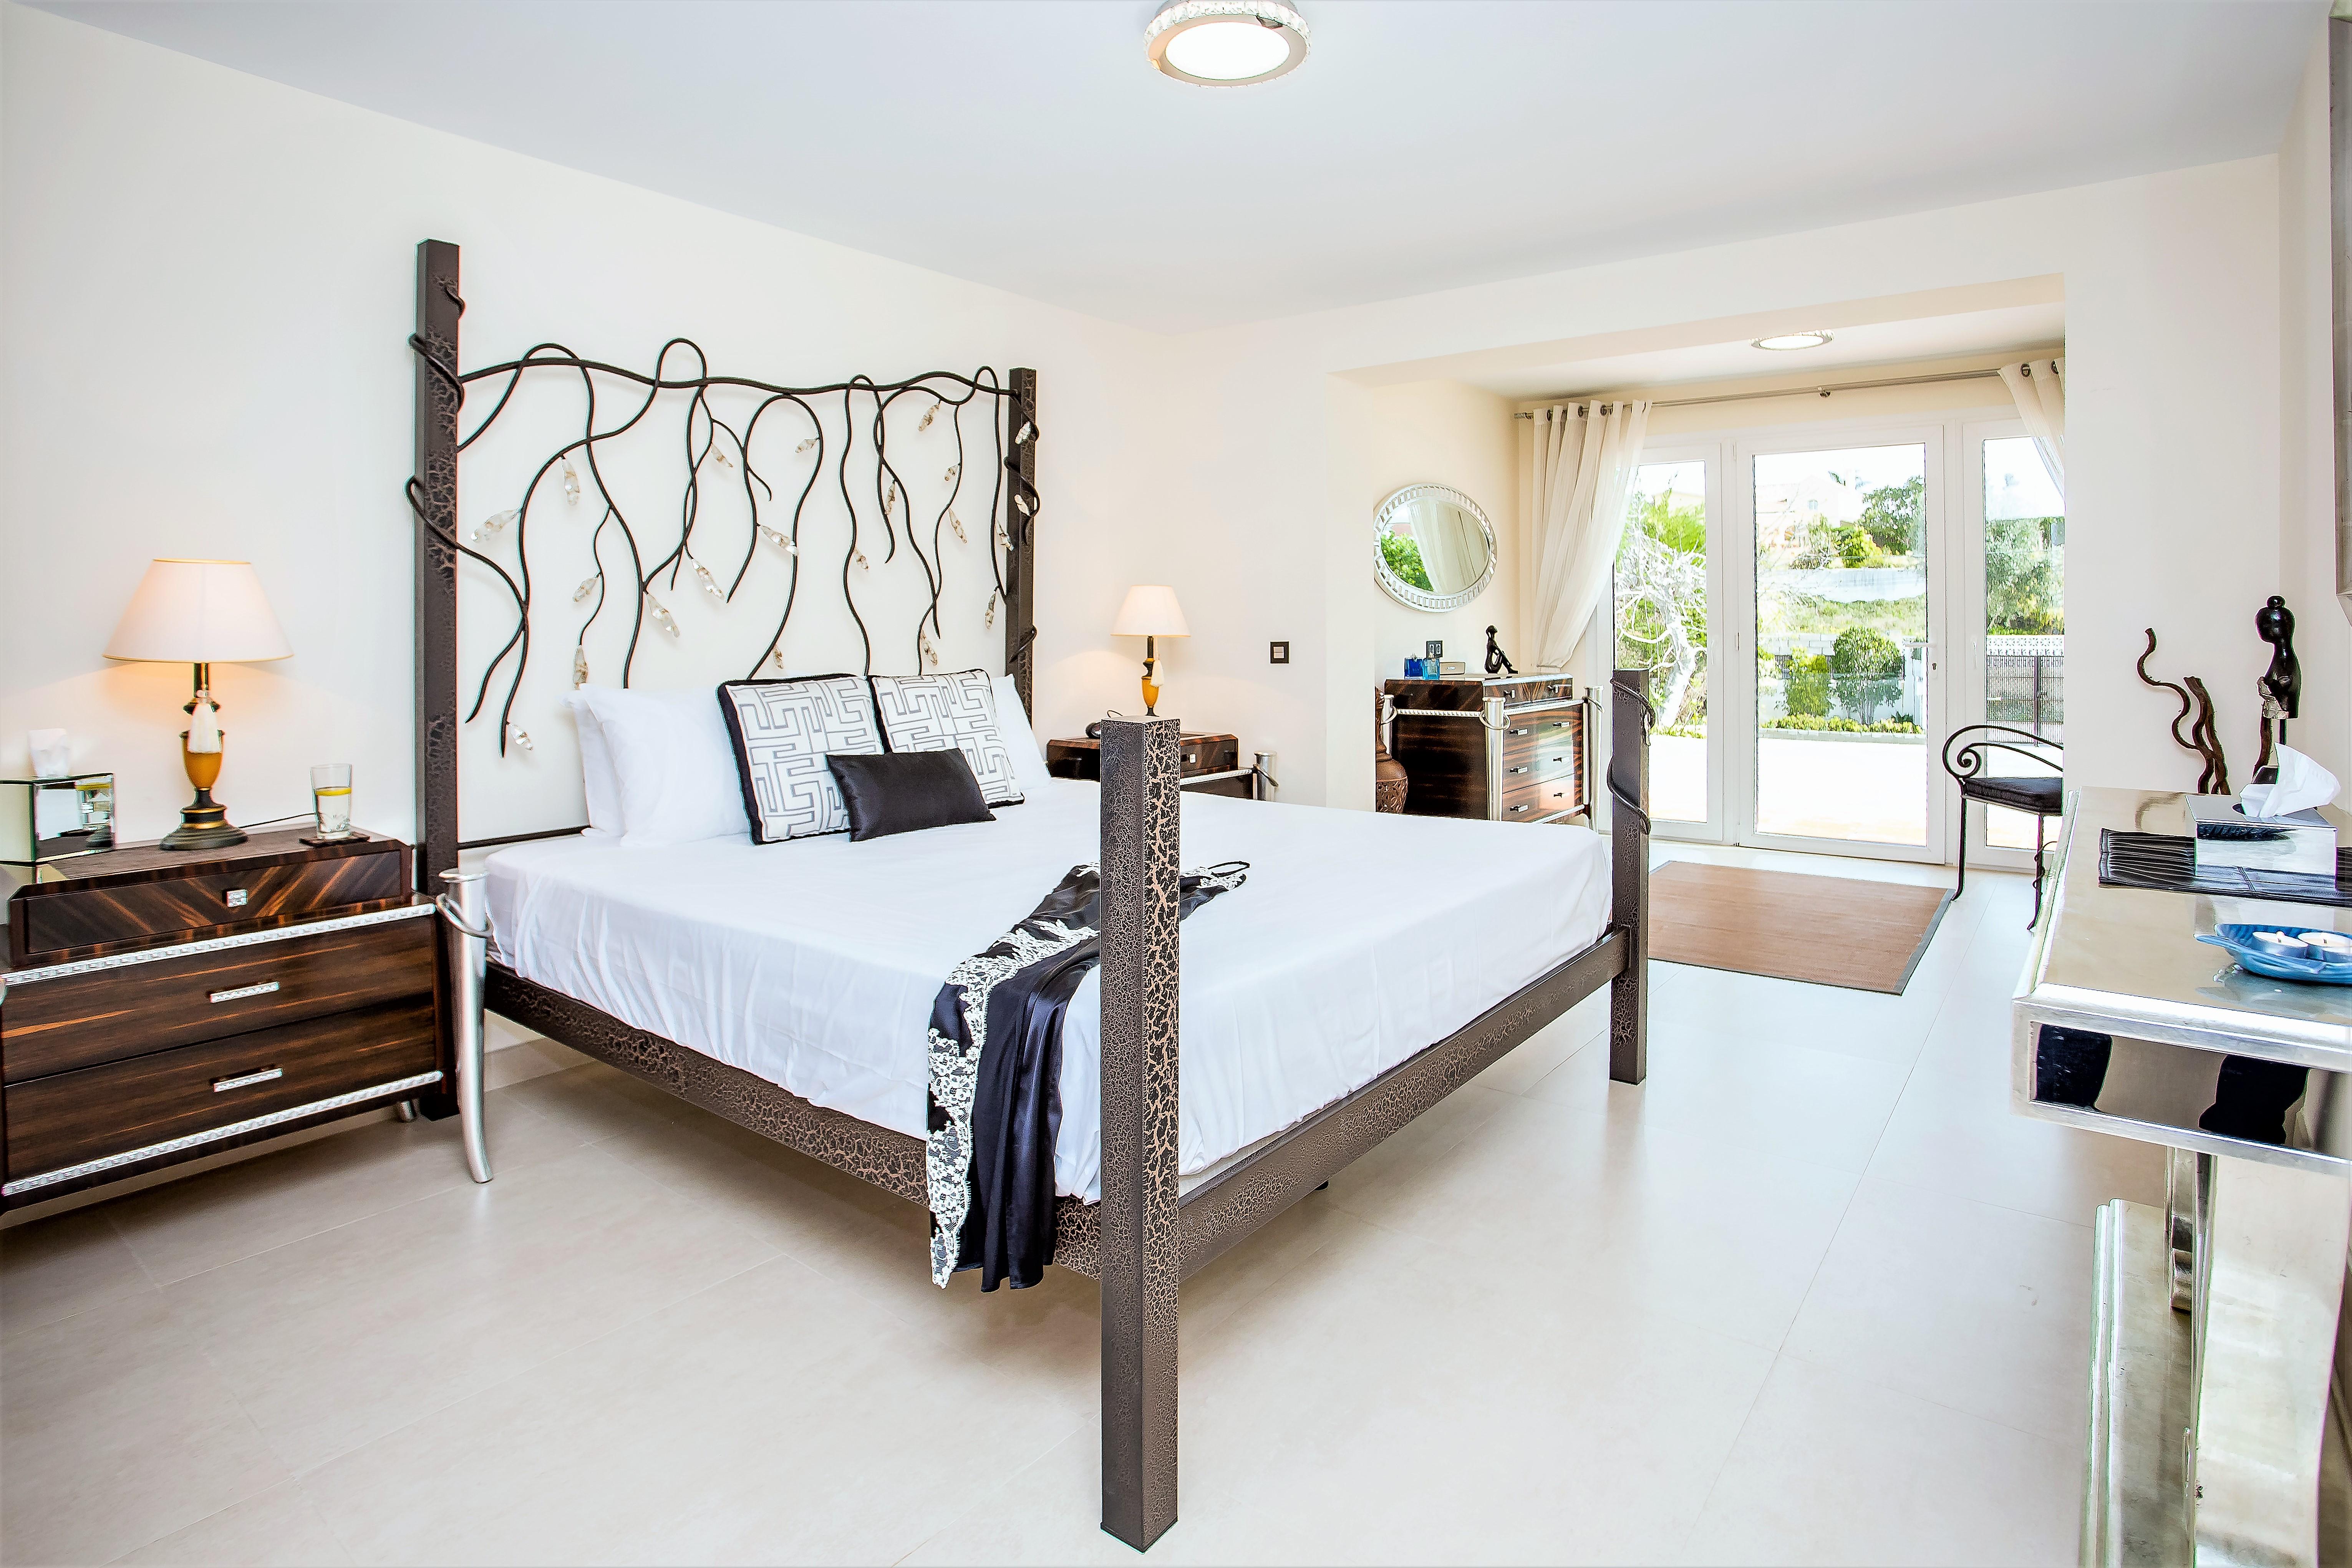 Apartment 8 Bedroom VILLA BY PUERTO BANUS   SEA 5 min                                photo 16768654